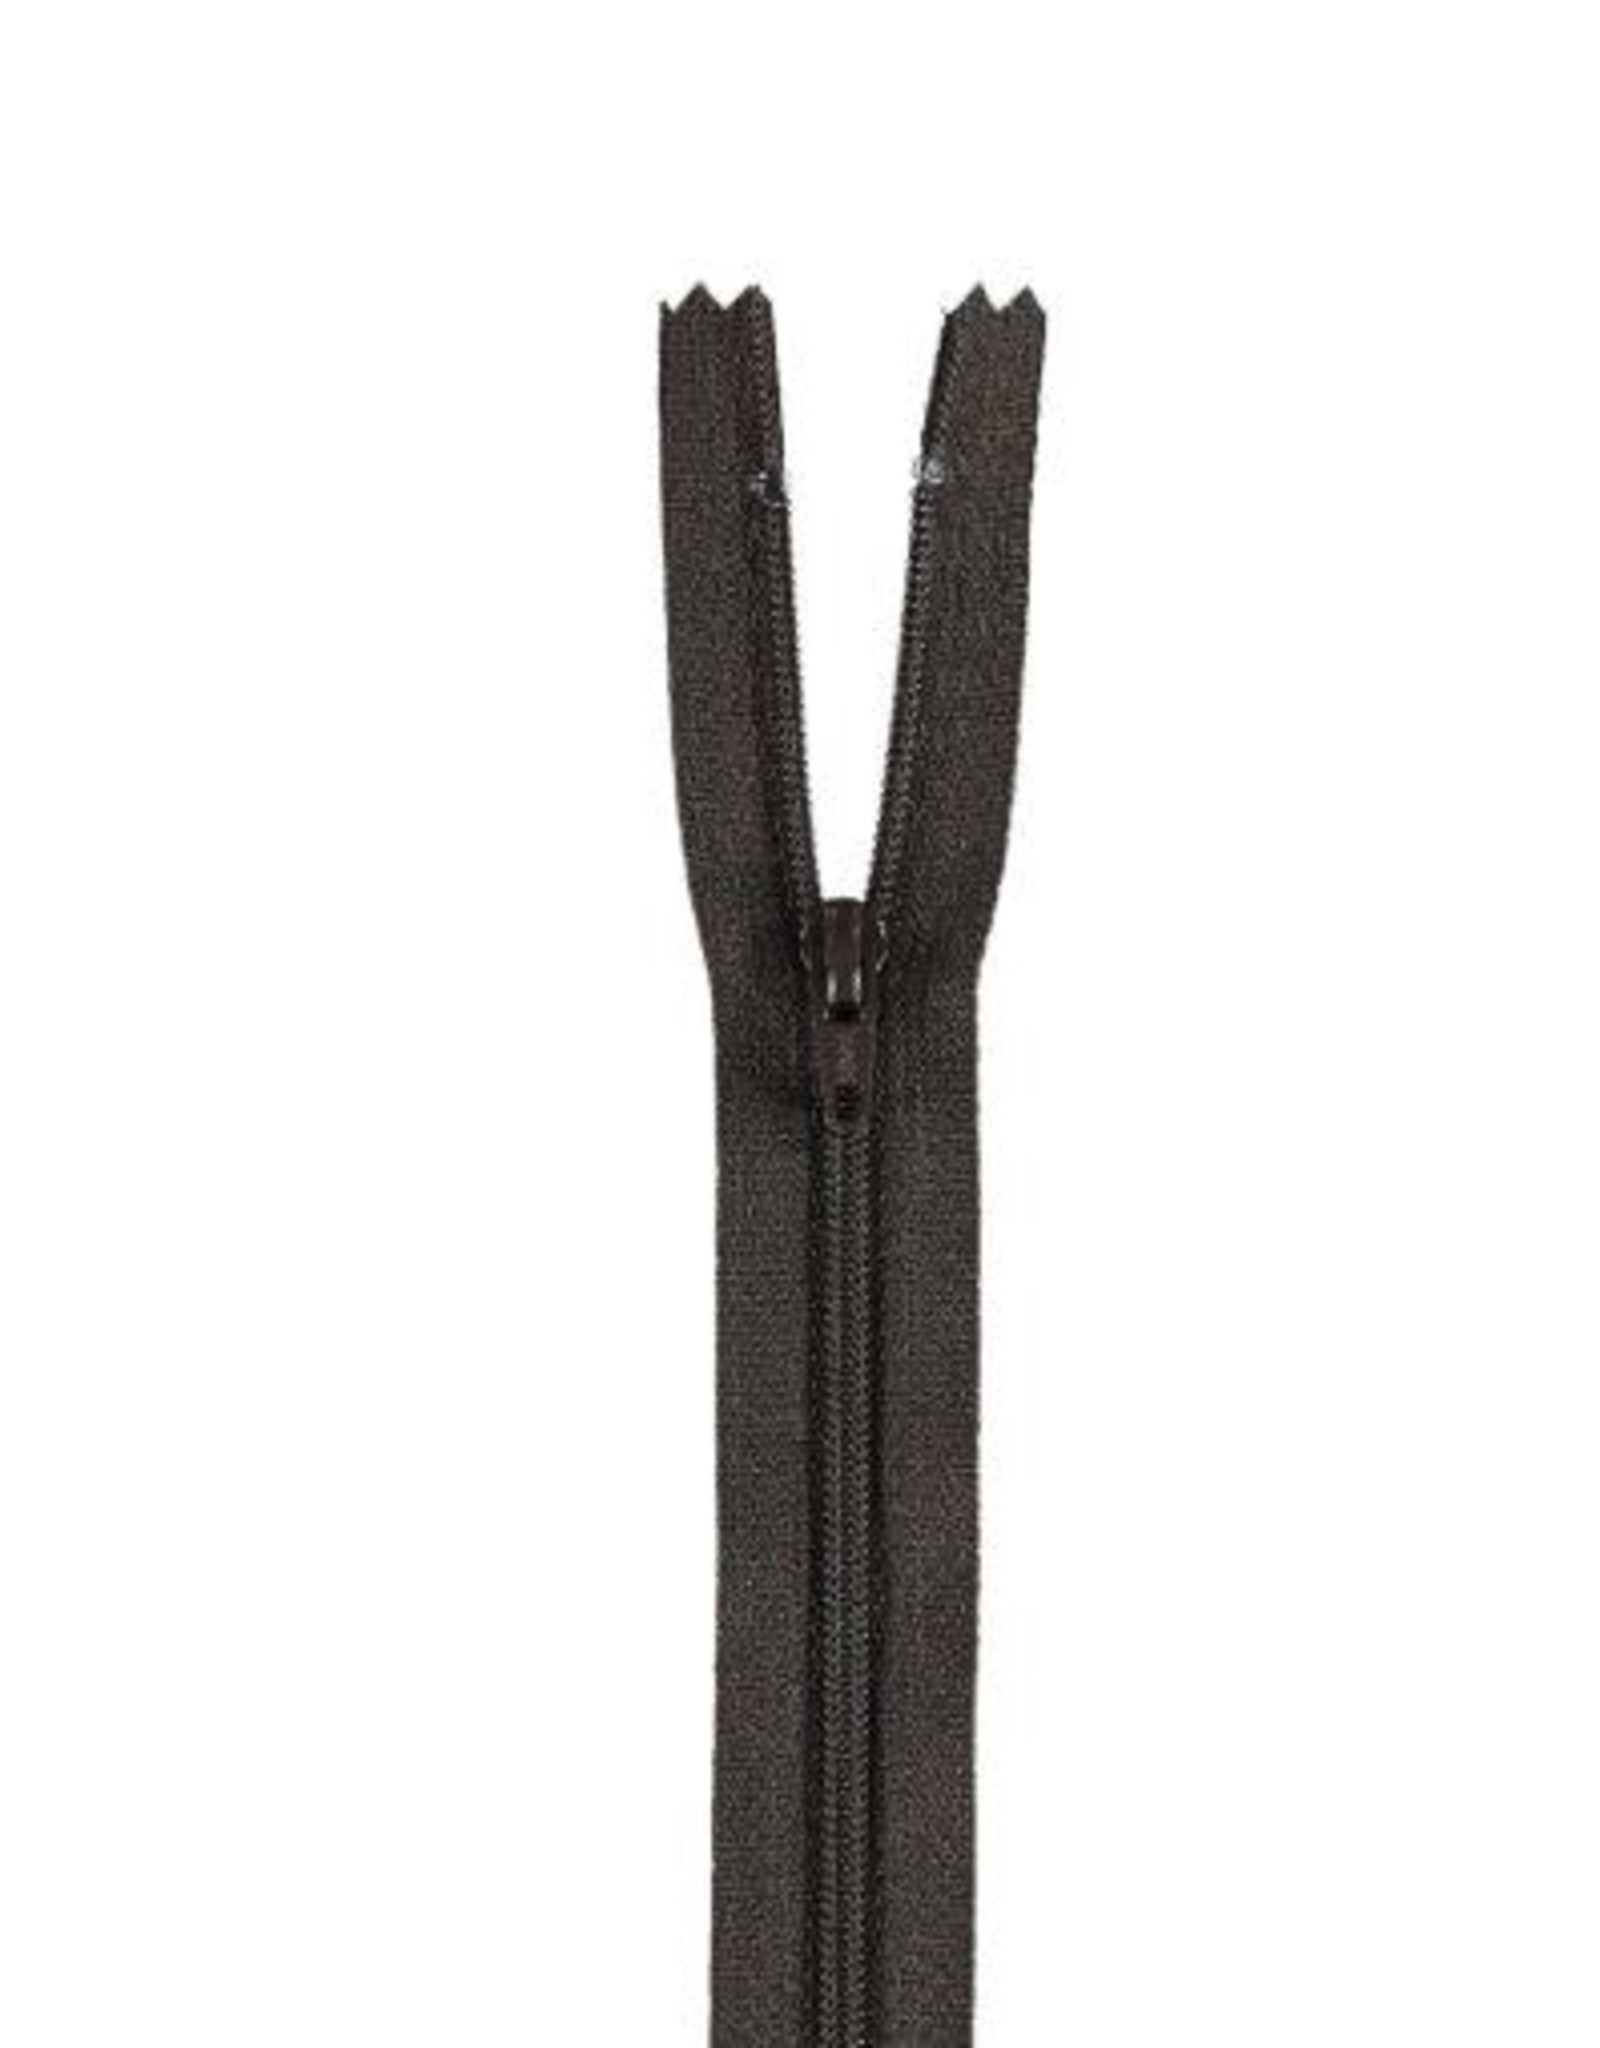 YKK Spiraalrits niet-DB 3mm zwart bruin 916-20cm